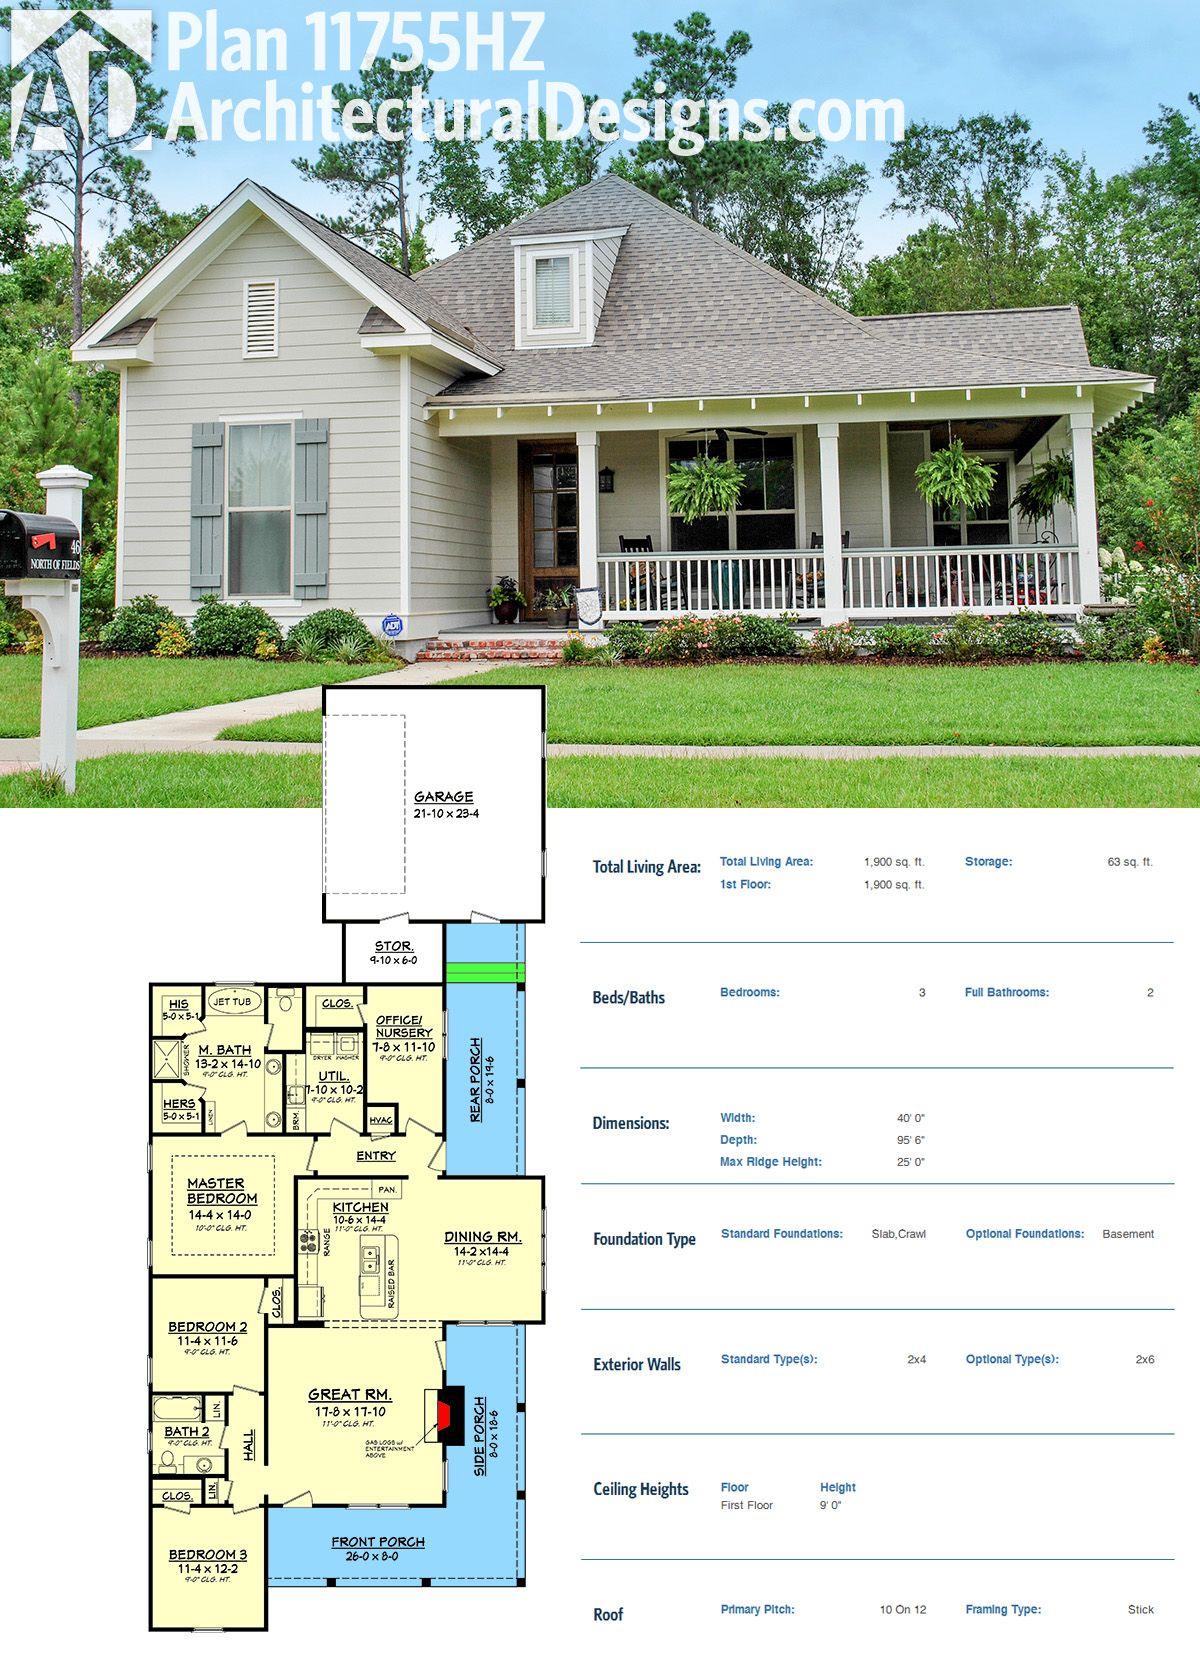 Plan HZ Cozy 3 Bedroom Cottage House Plan